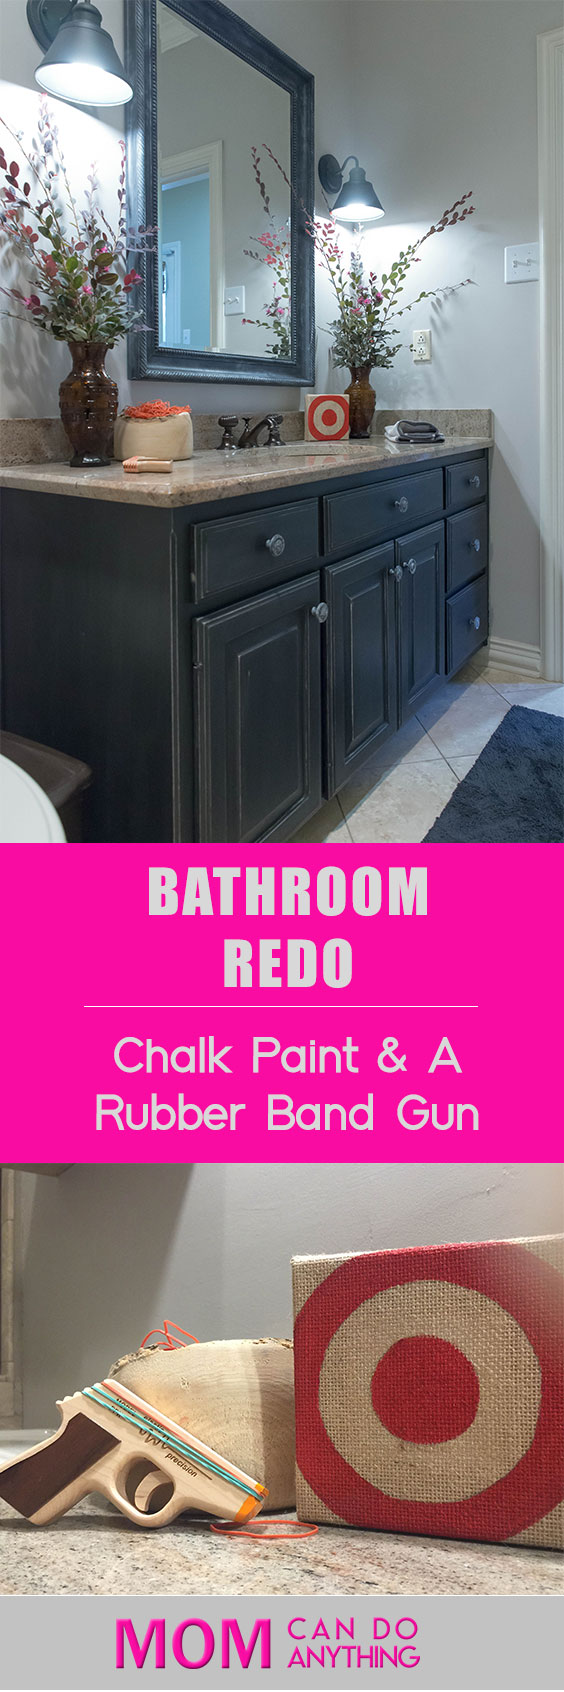 Bathroom-Redo2